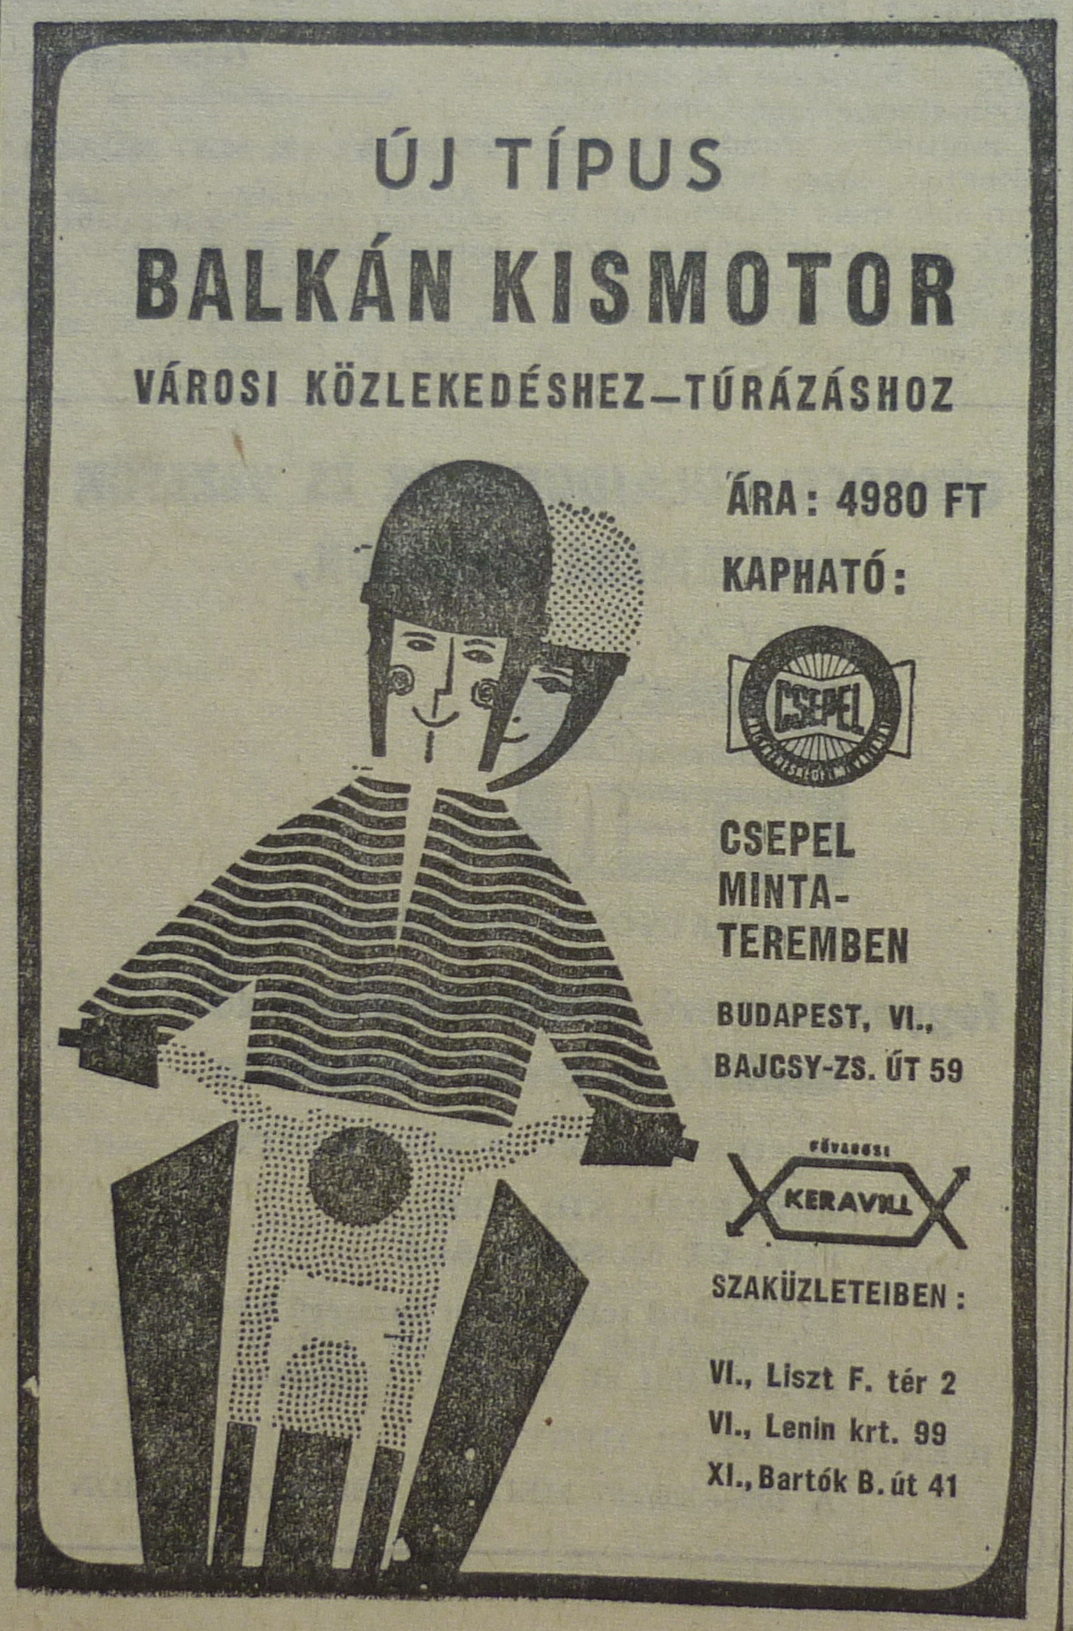 balkankismotor-197007-magyarnemzethirdetes.jpg